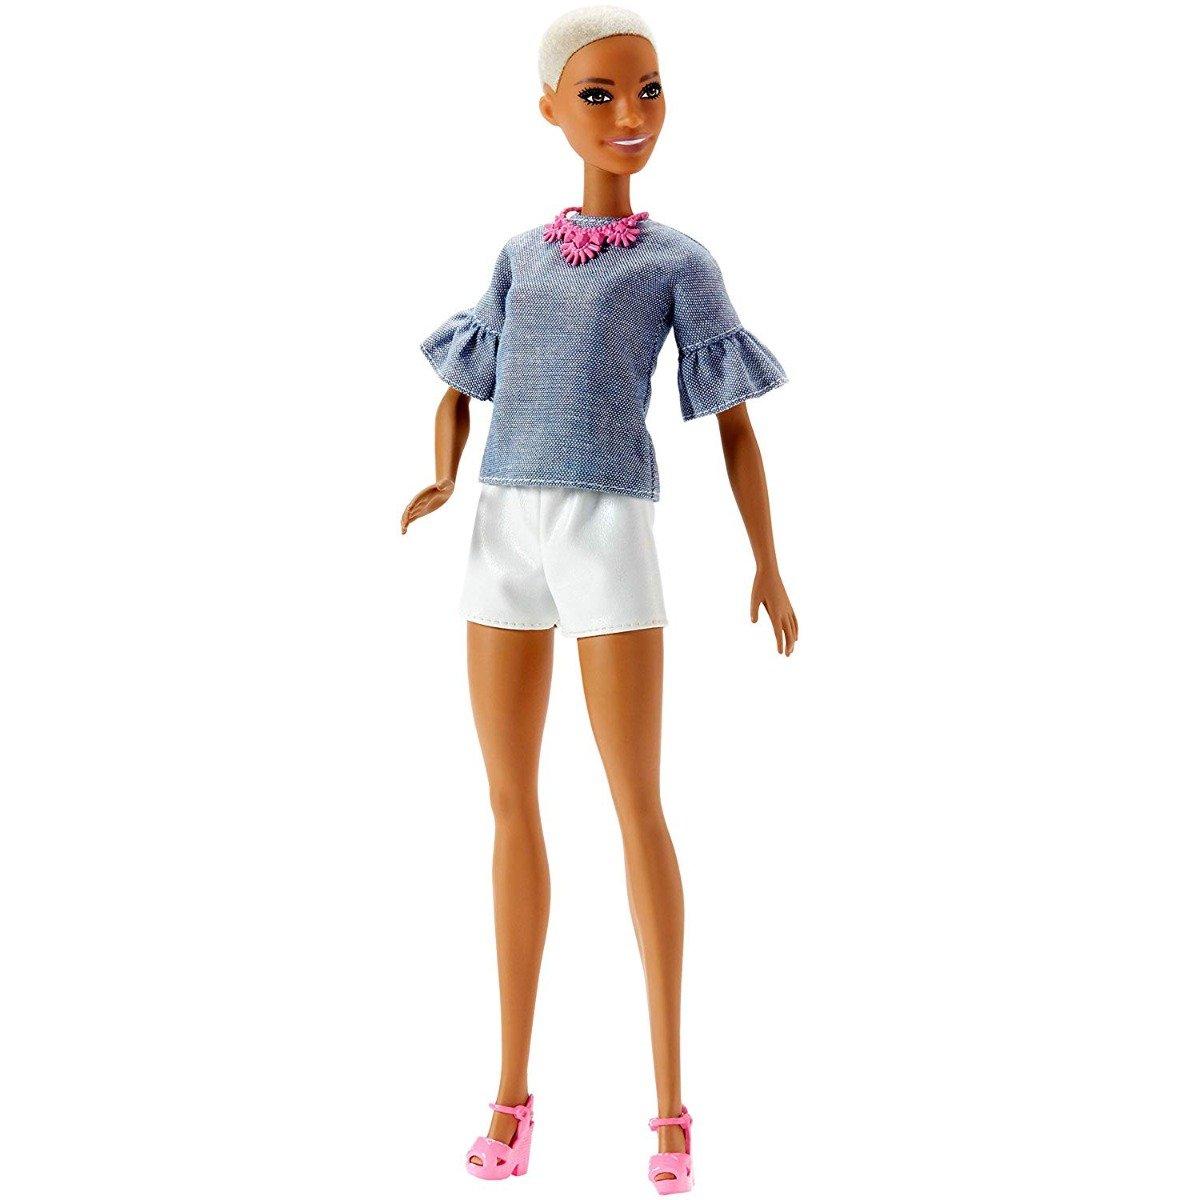 Papusa Barbie Fashionistas - Style. FHY40